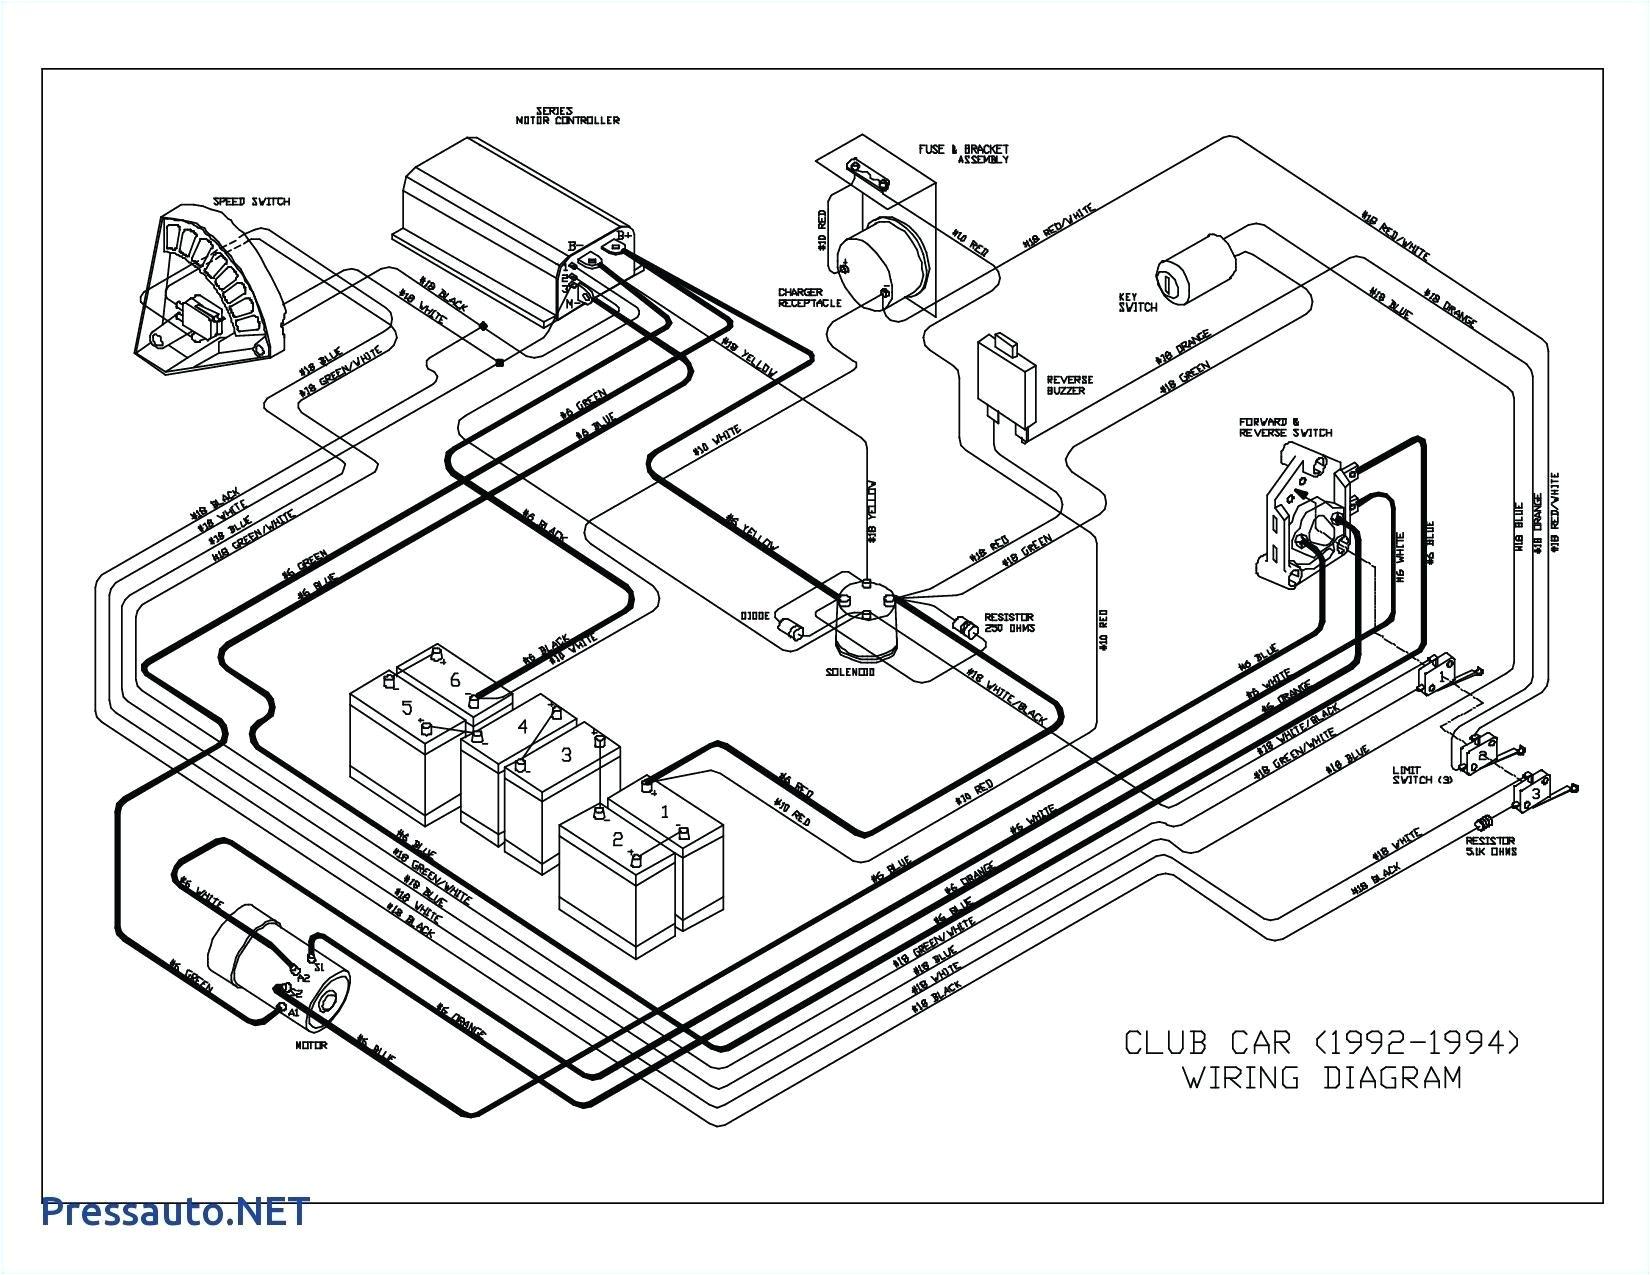 wiring diagram for club car 12v free download wiring diagram pos golf cart wiring diagram free